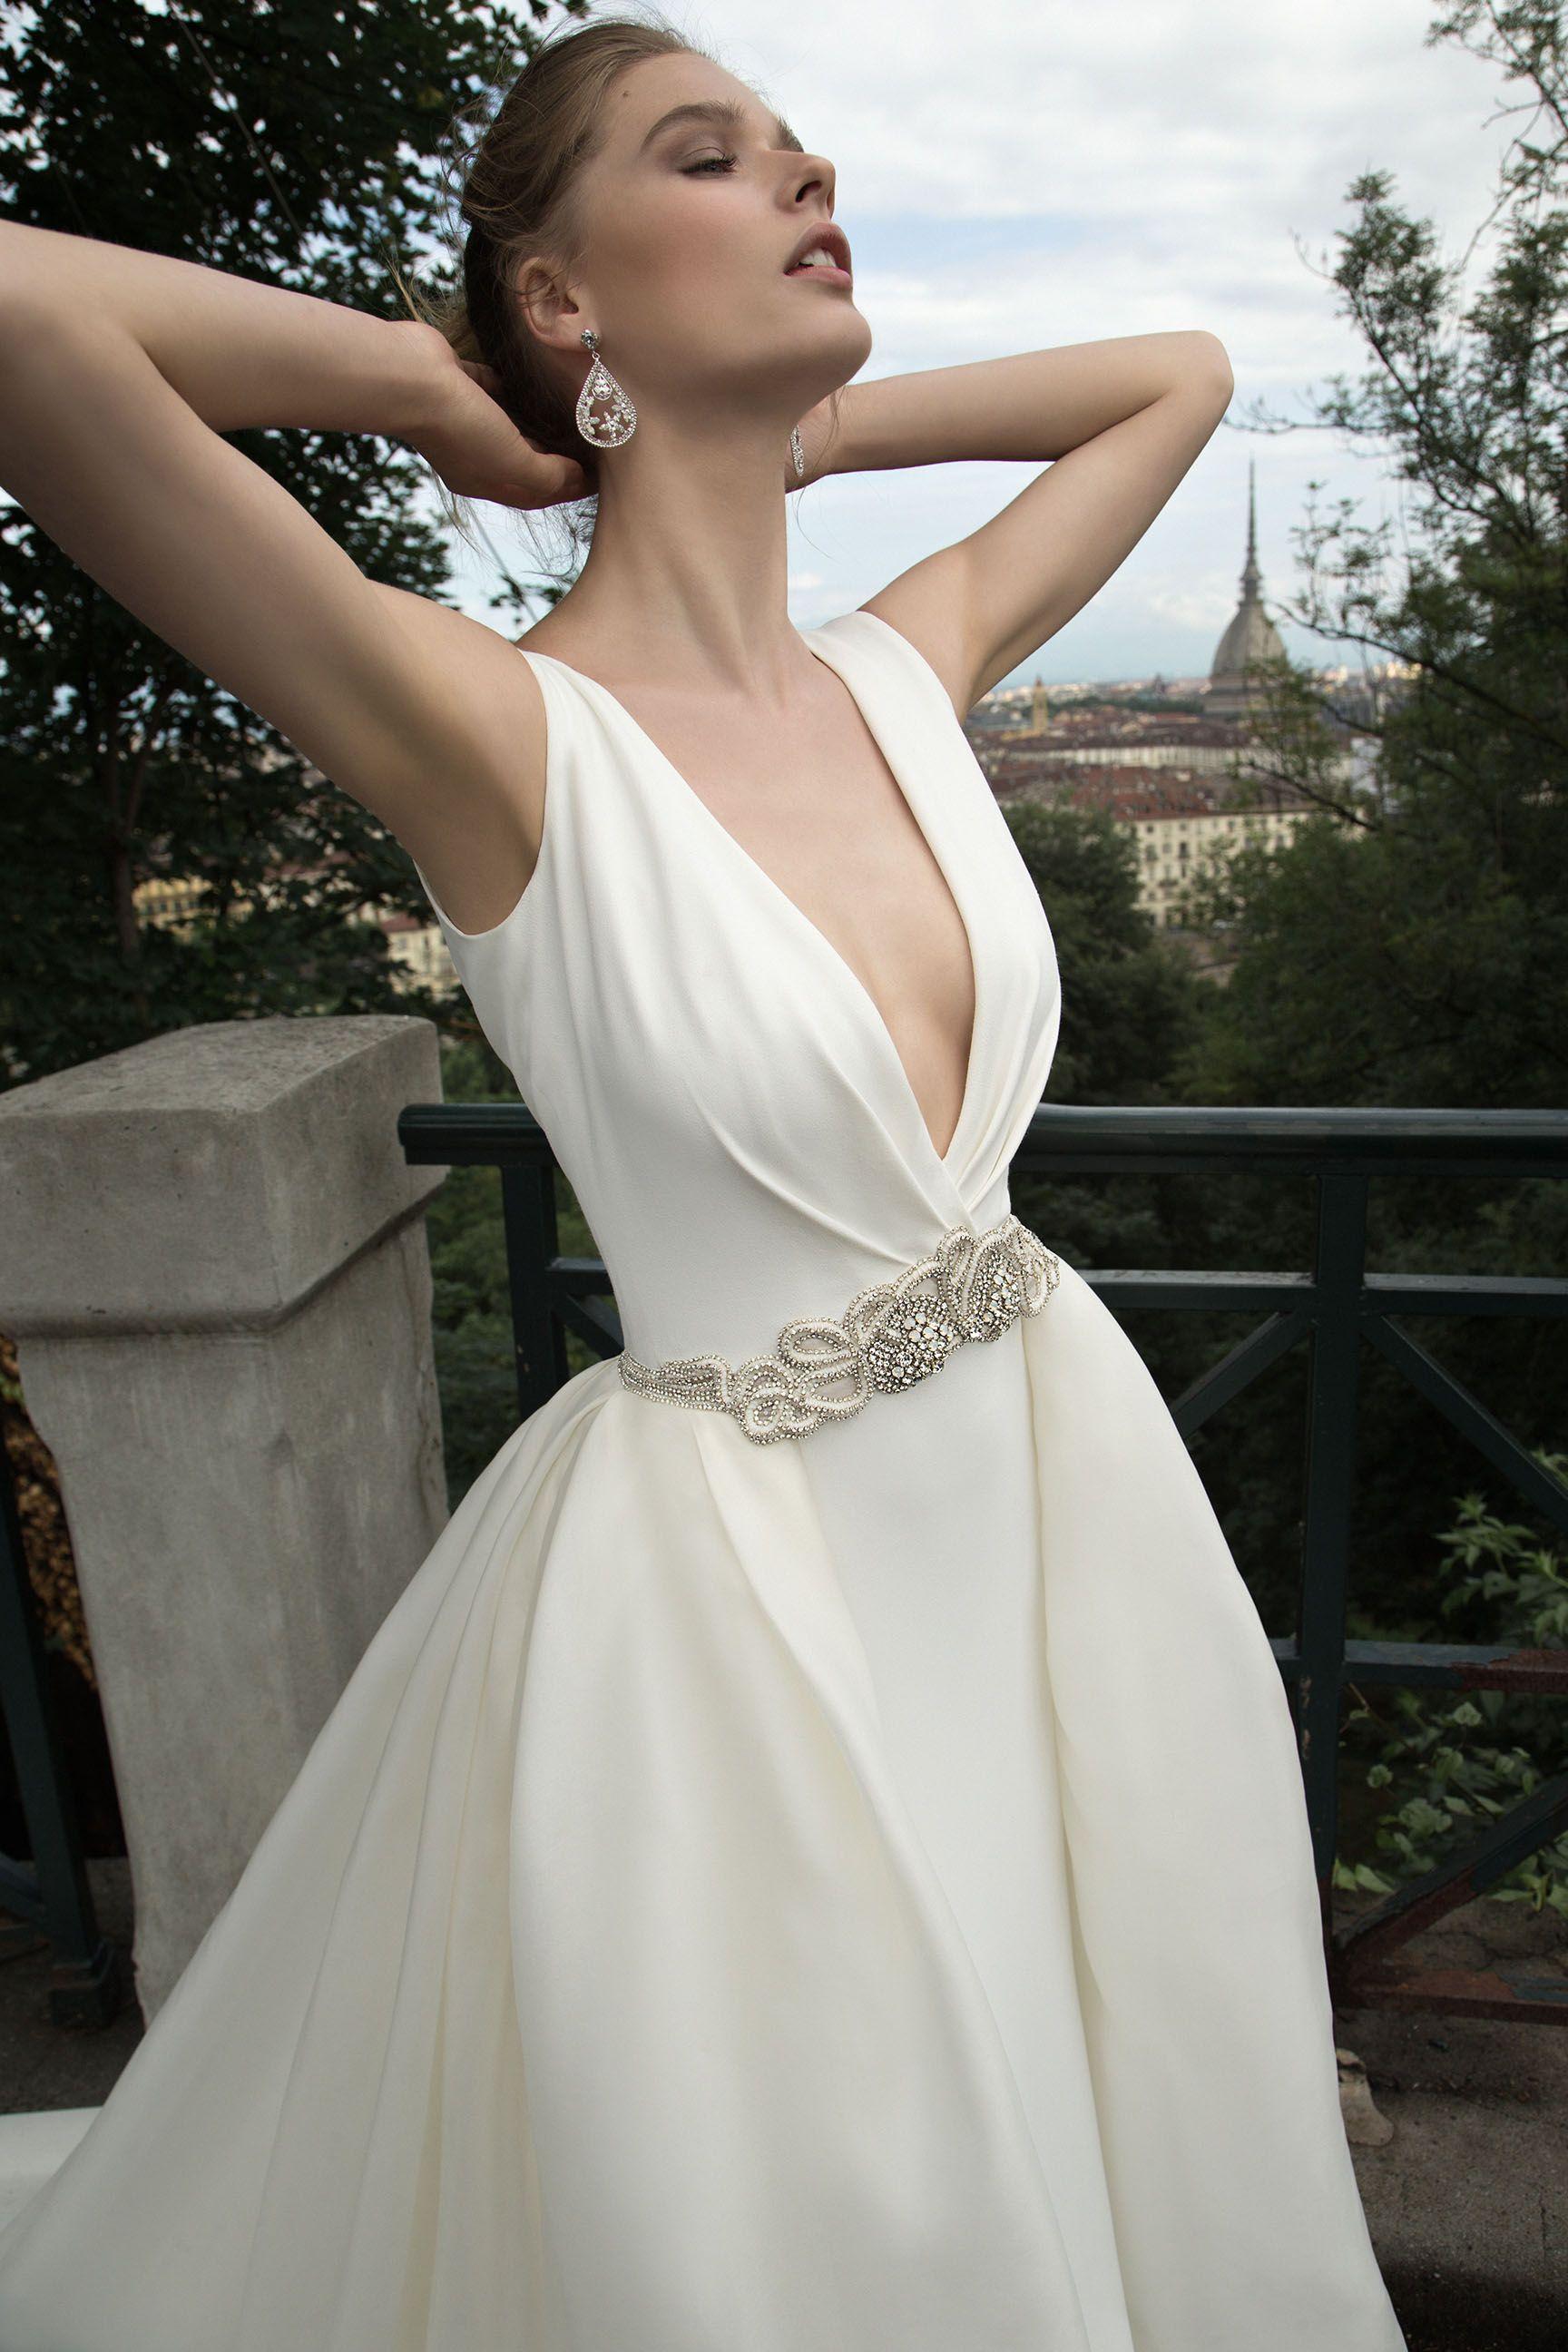 Alessandra rinaudo tecla weddings pinterest wedding